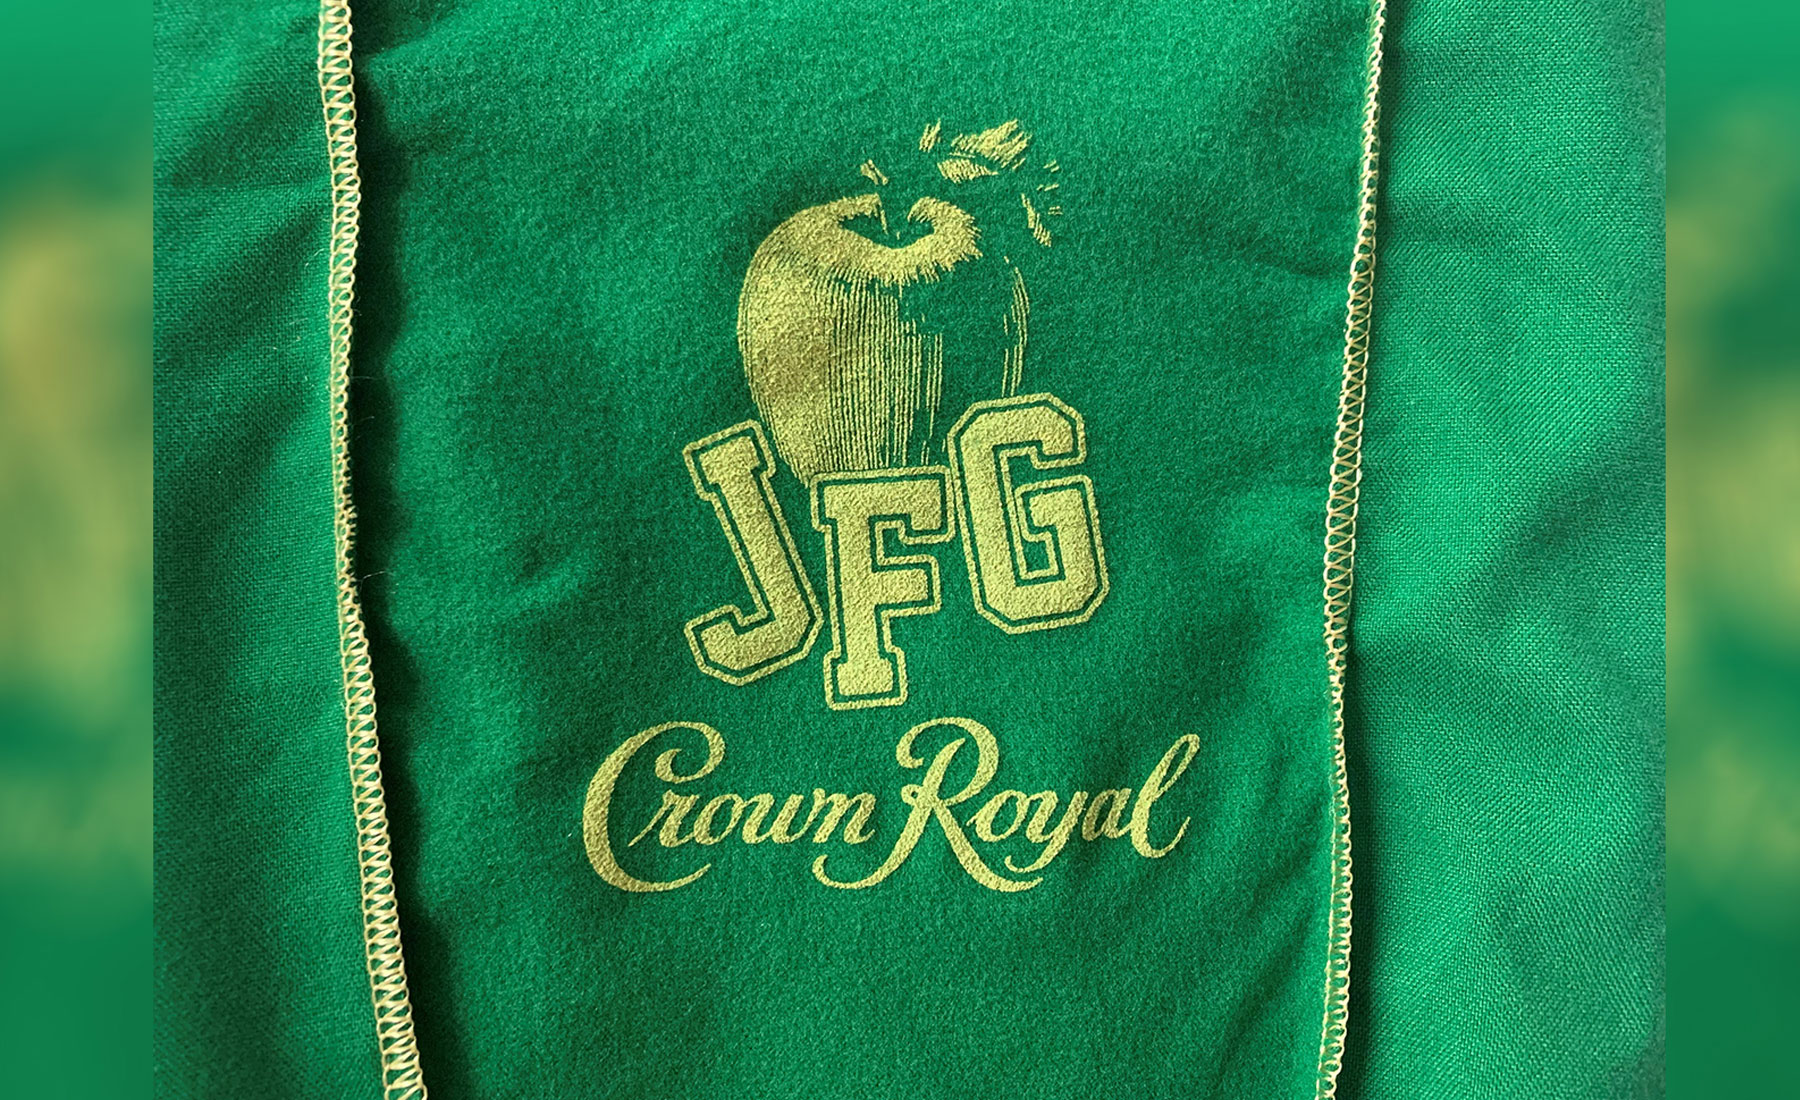 Crown Royal Regal Apple x Joe Freshgoods